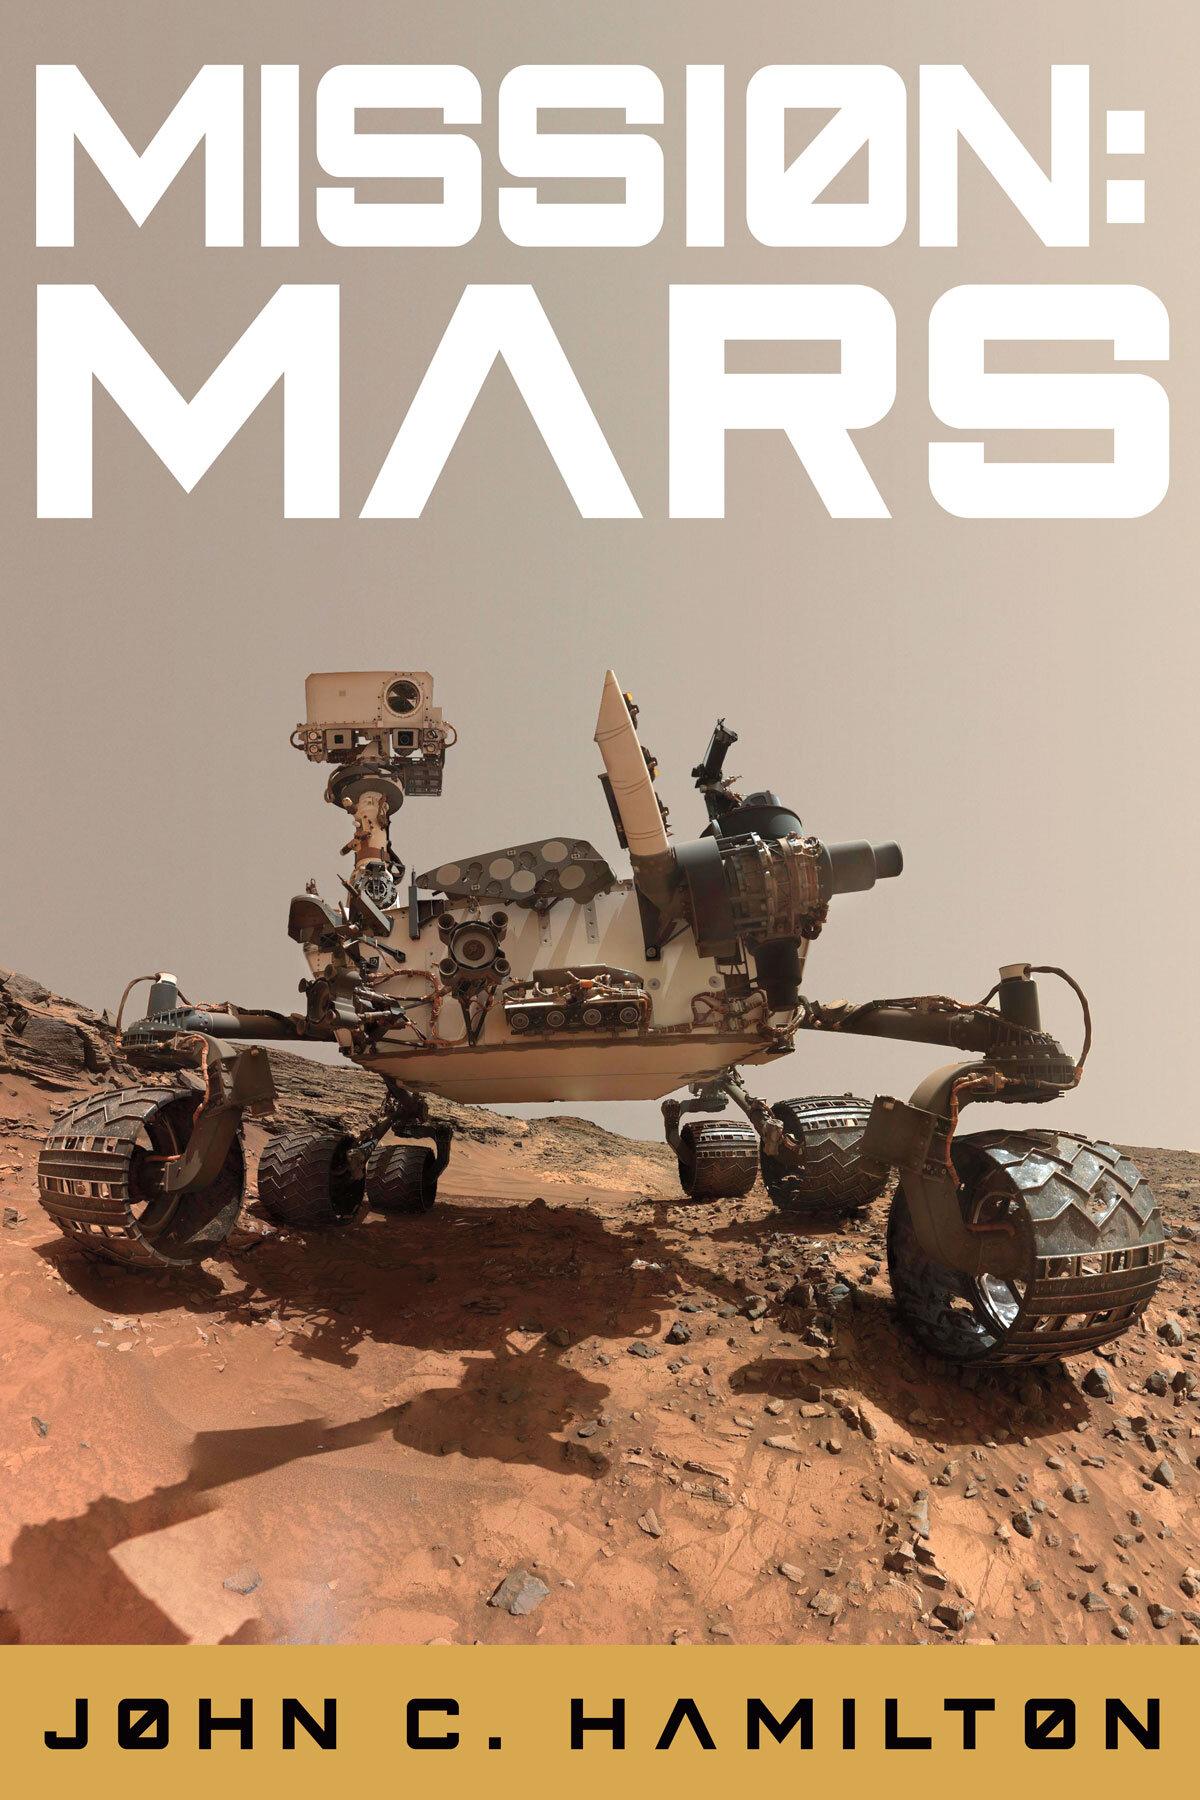 2020-Mission-Mars-Cover-1200x1800.jpg